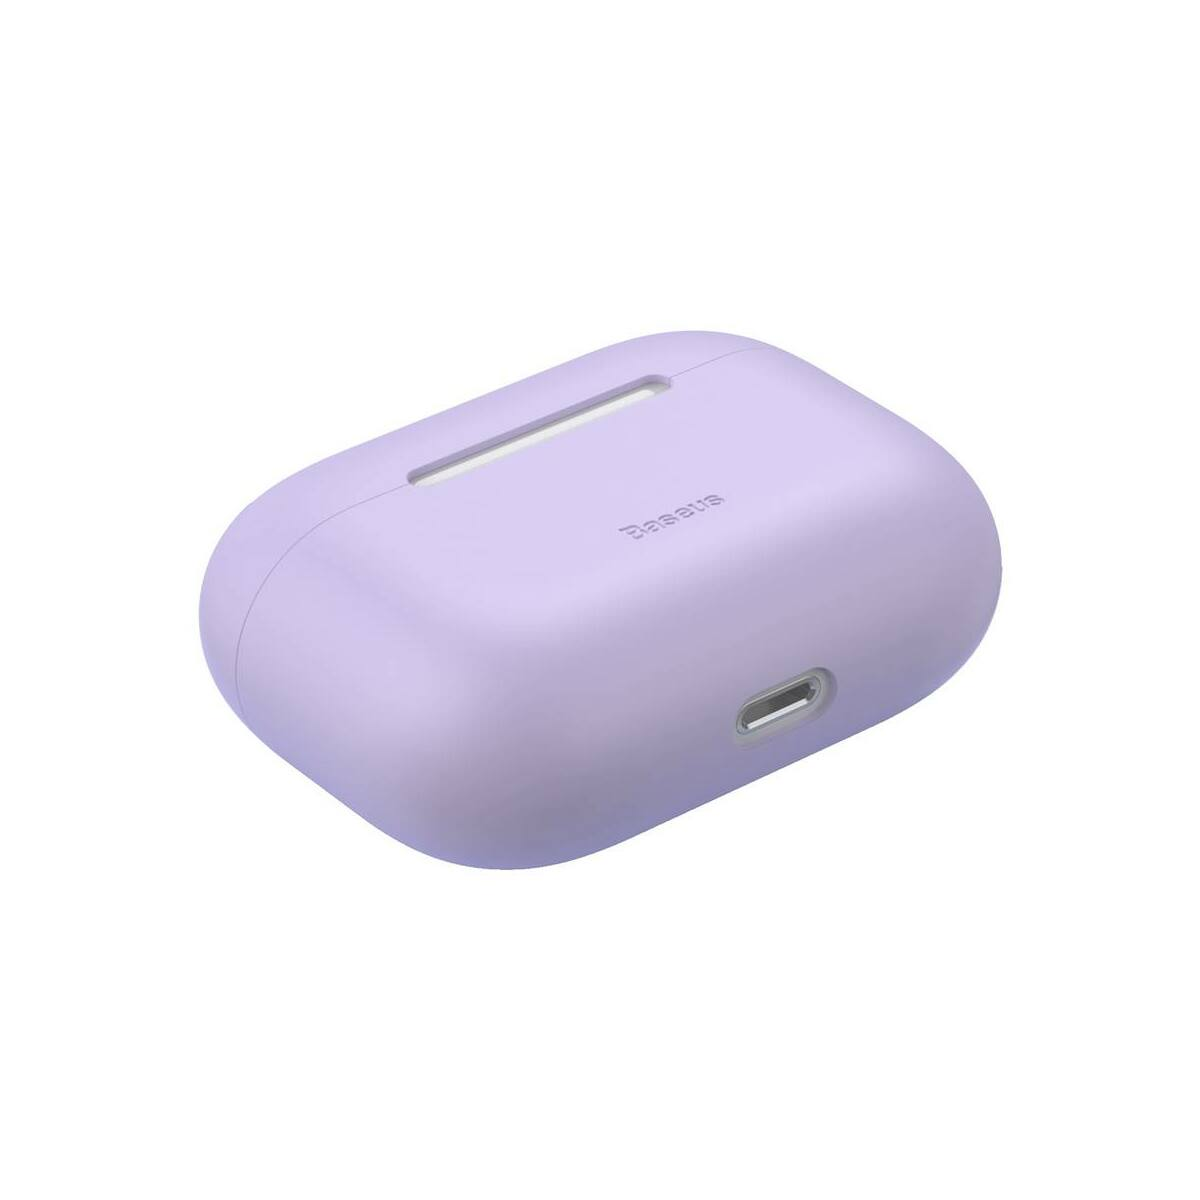 Baseus Airpods Pro tok, Super Thin szilikon, szuper vékony anyagból, lila (WIAPPOD-ABZ05)